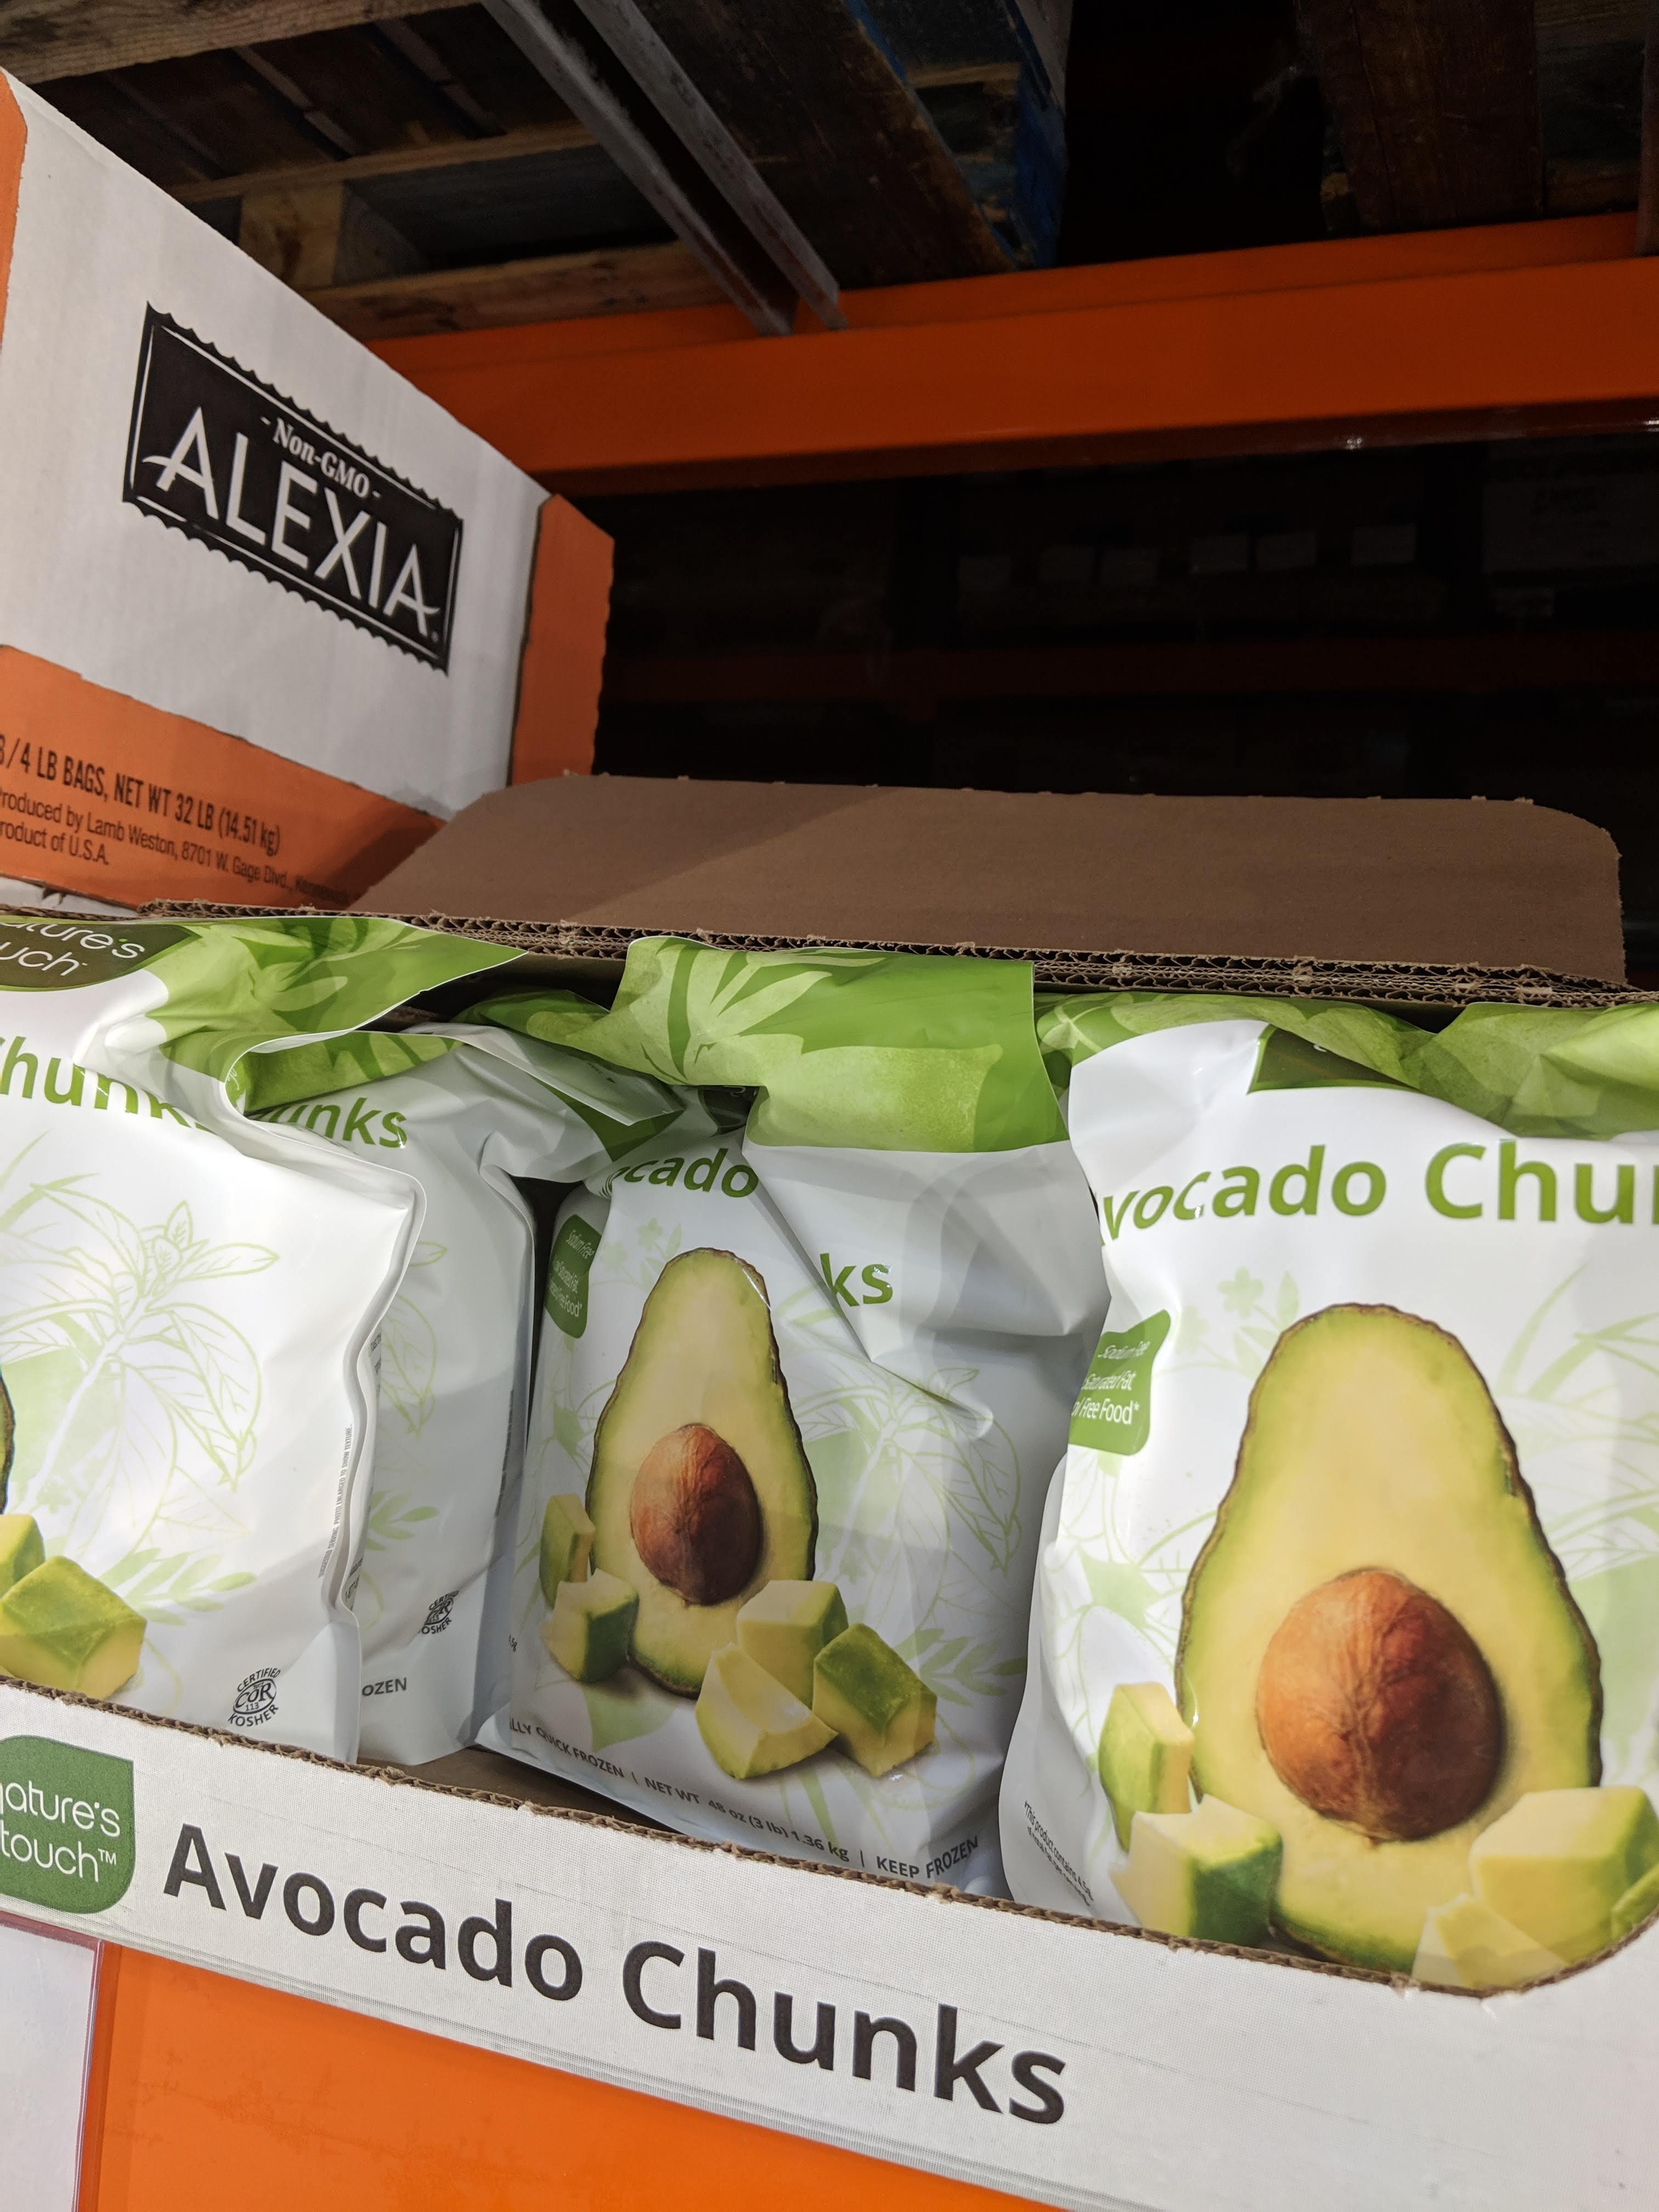 Costco Frozen Avocado Chunks Review | Kitchn